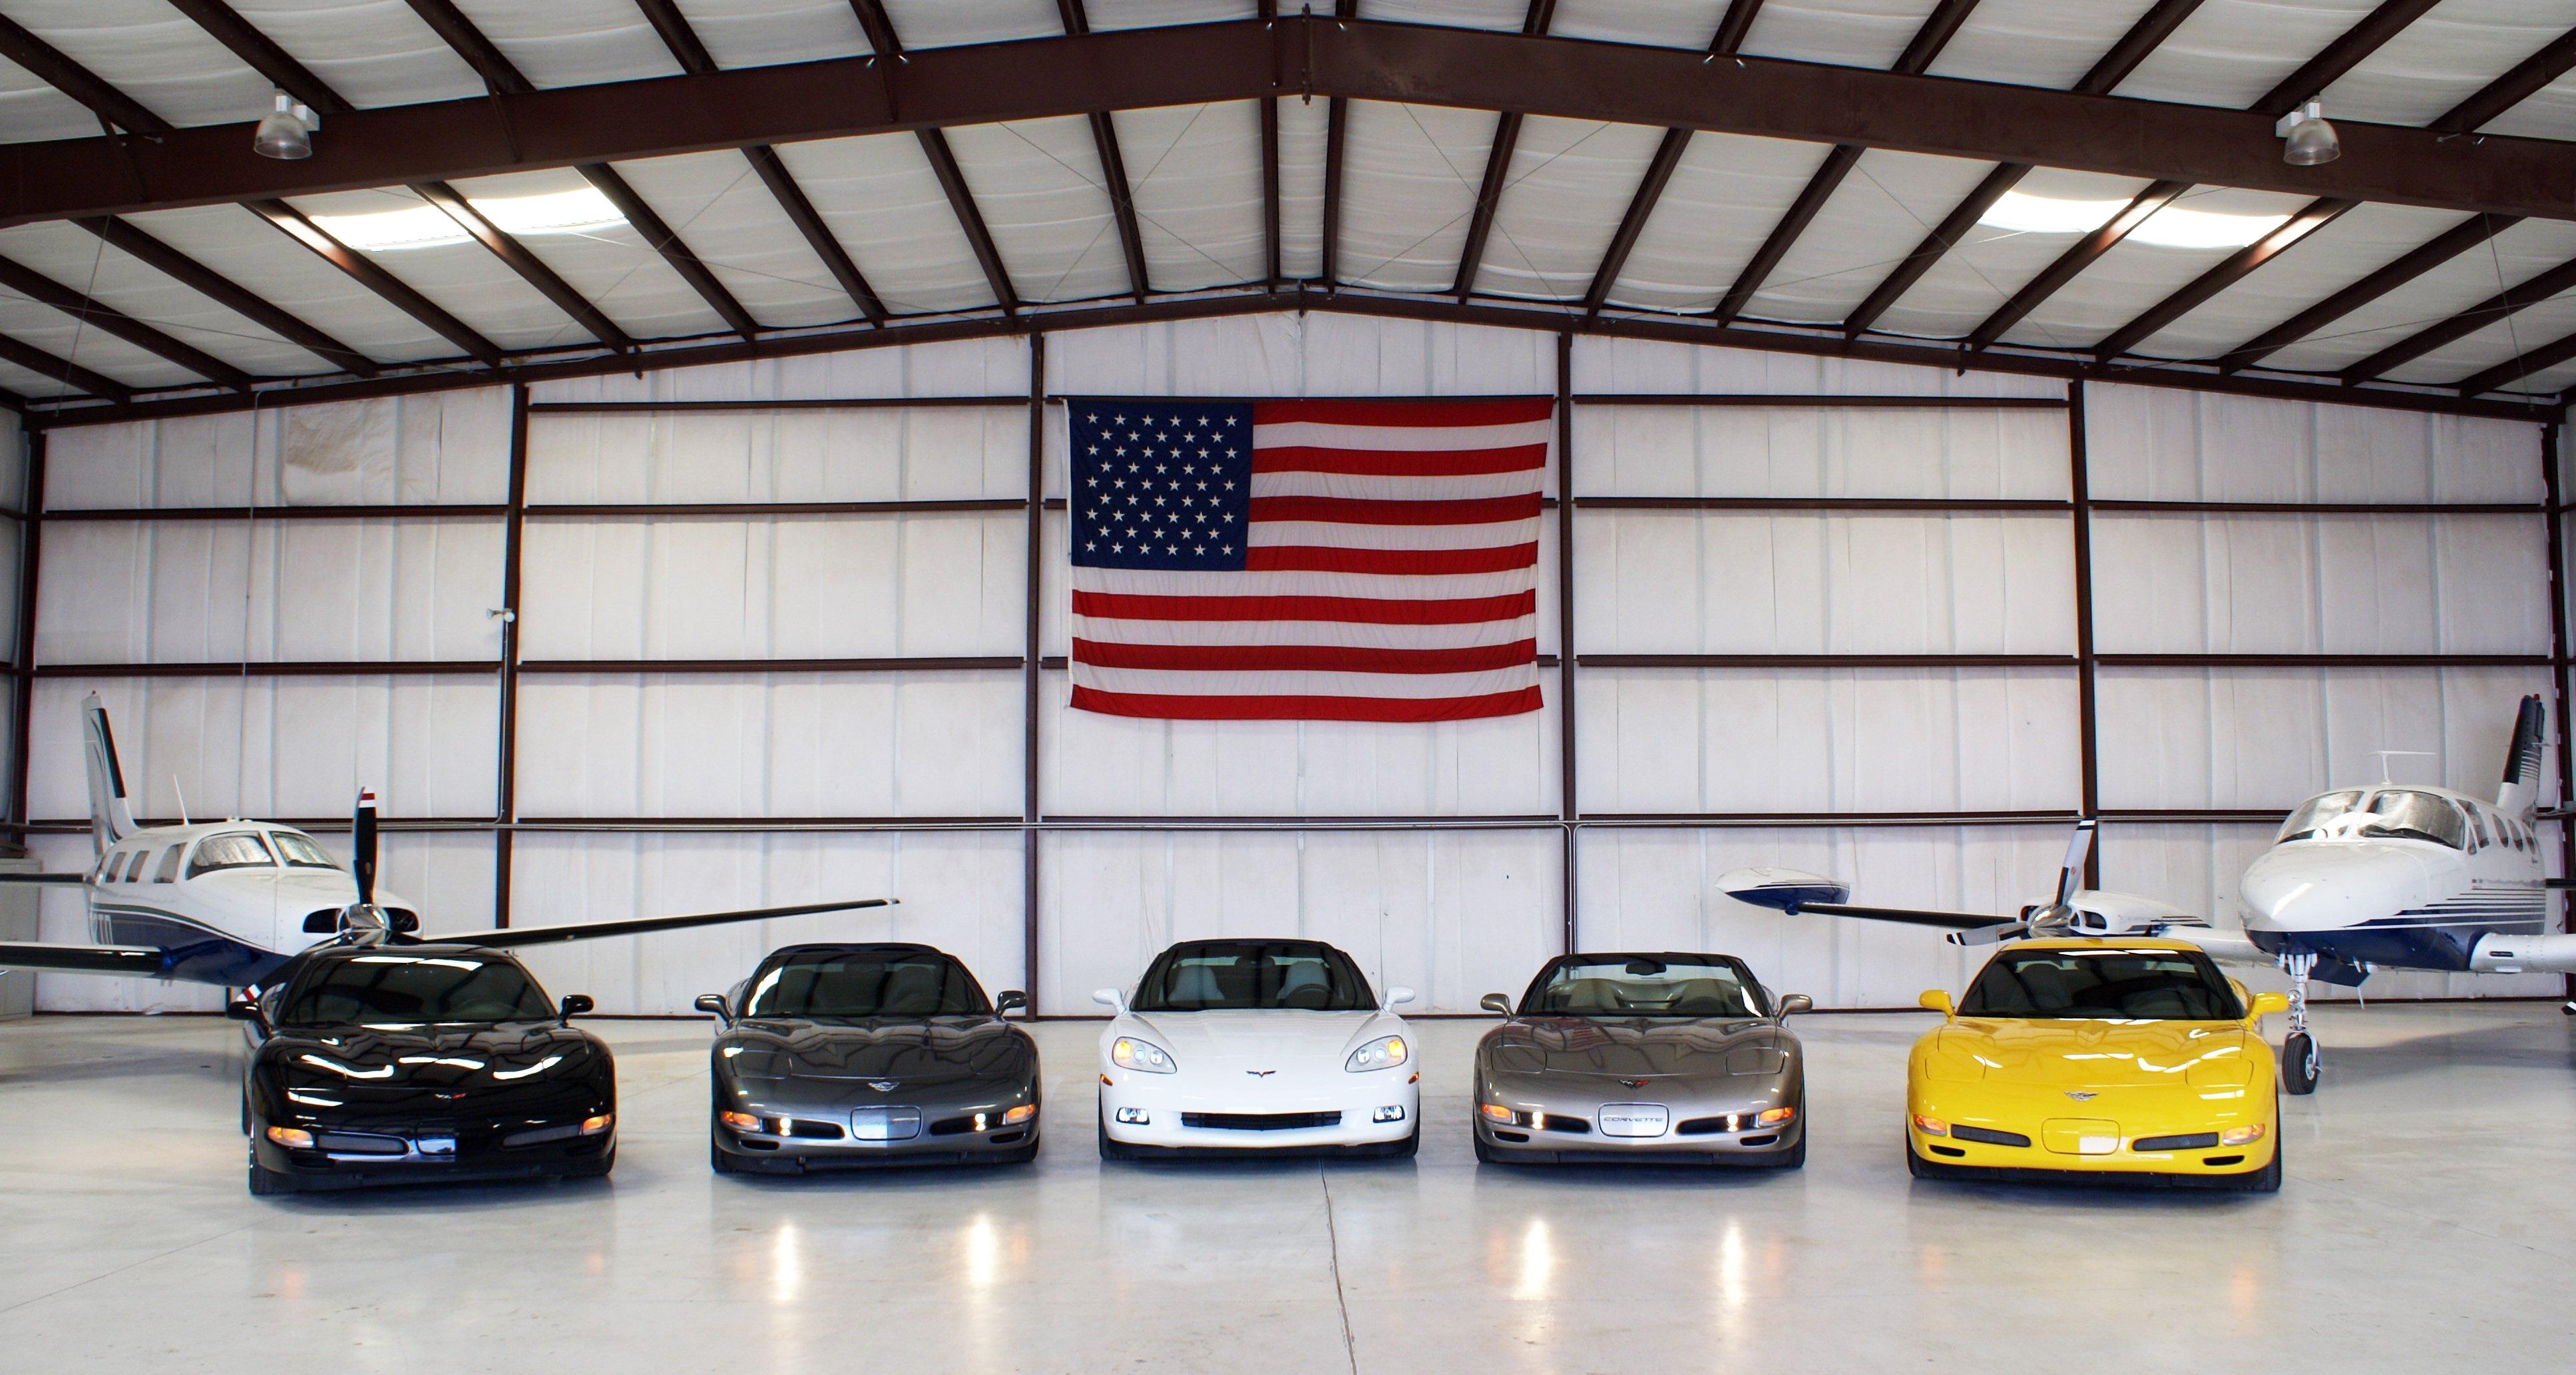 Free Images : car, airplane, plane, aircraft, jet, hanger